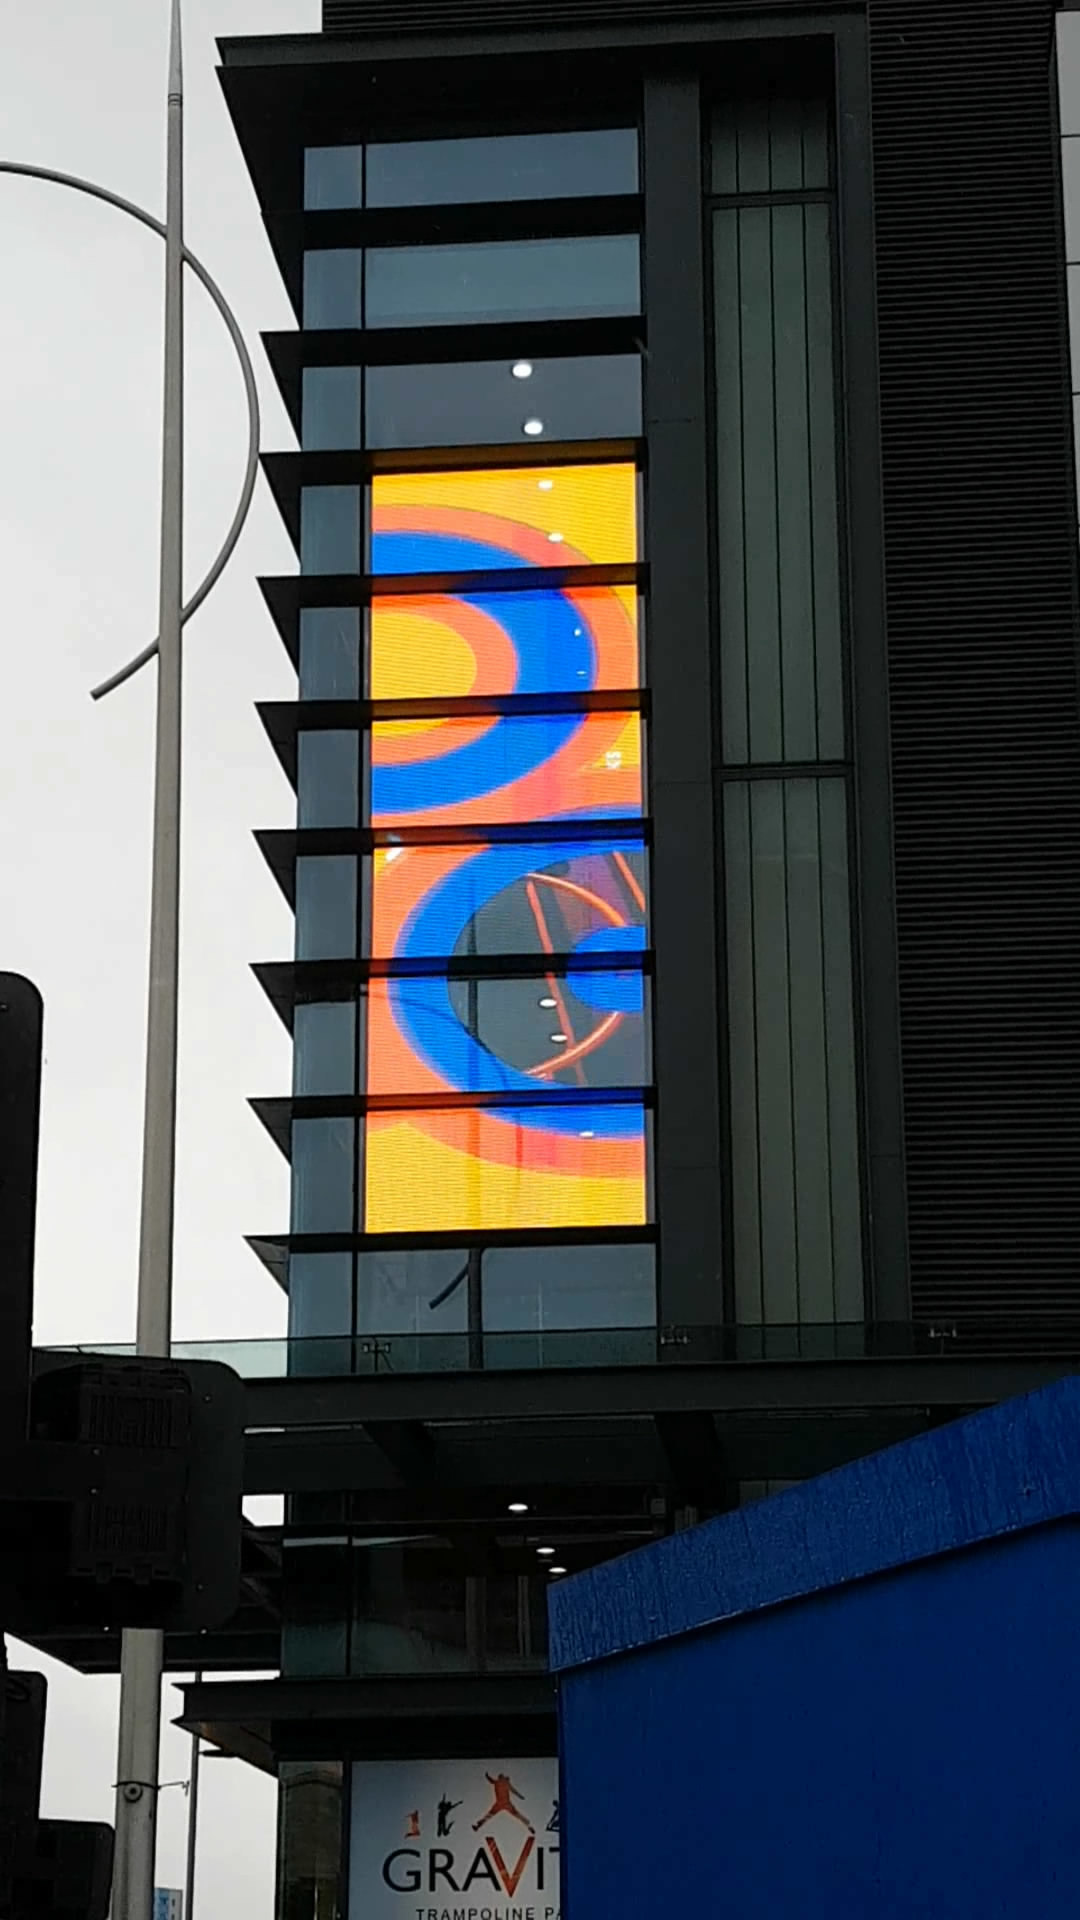 Windows Transparent LED Screen for Building Facade